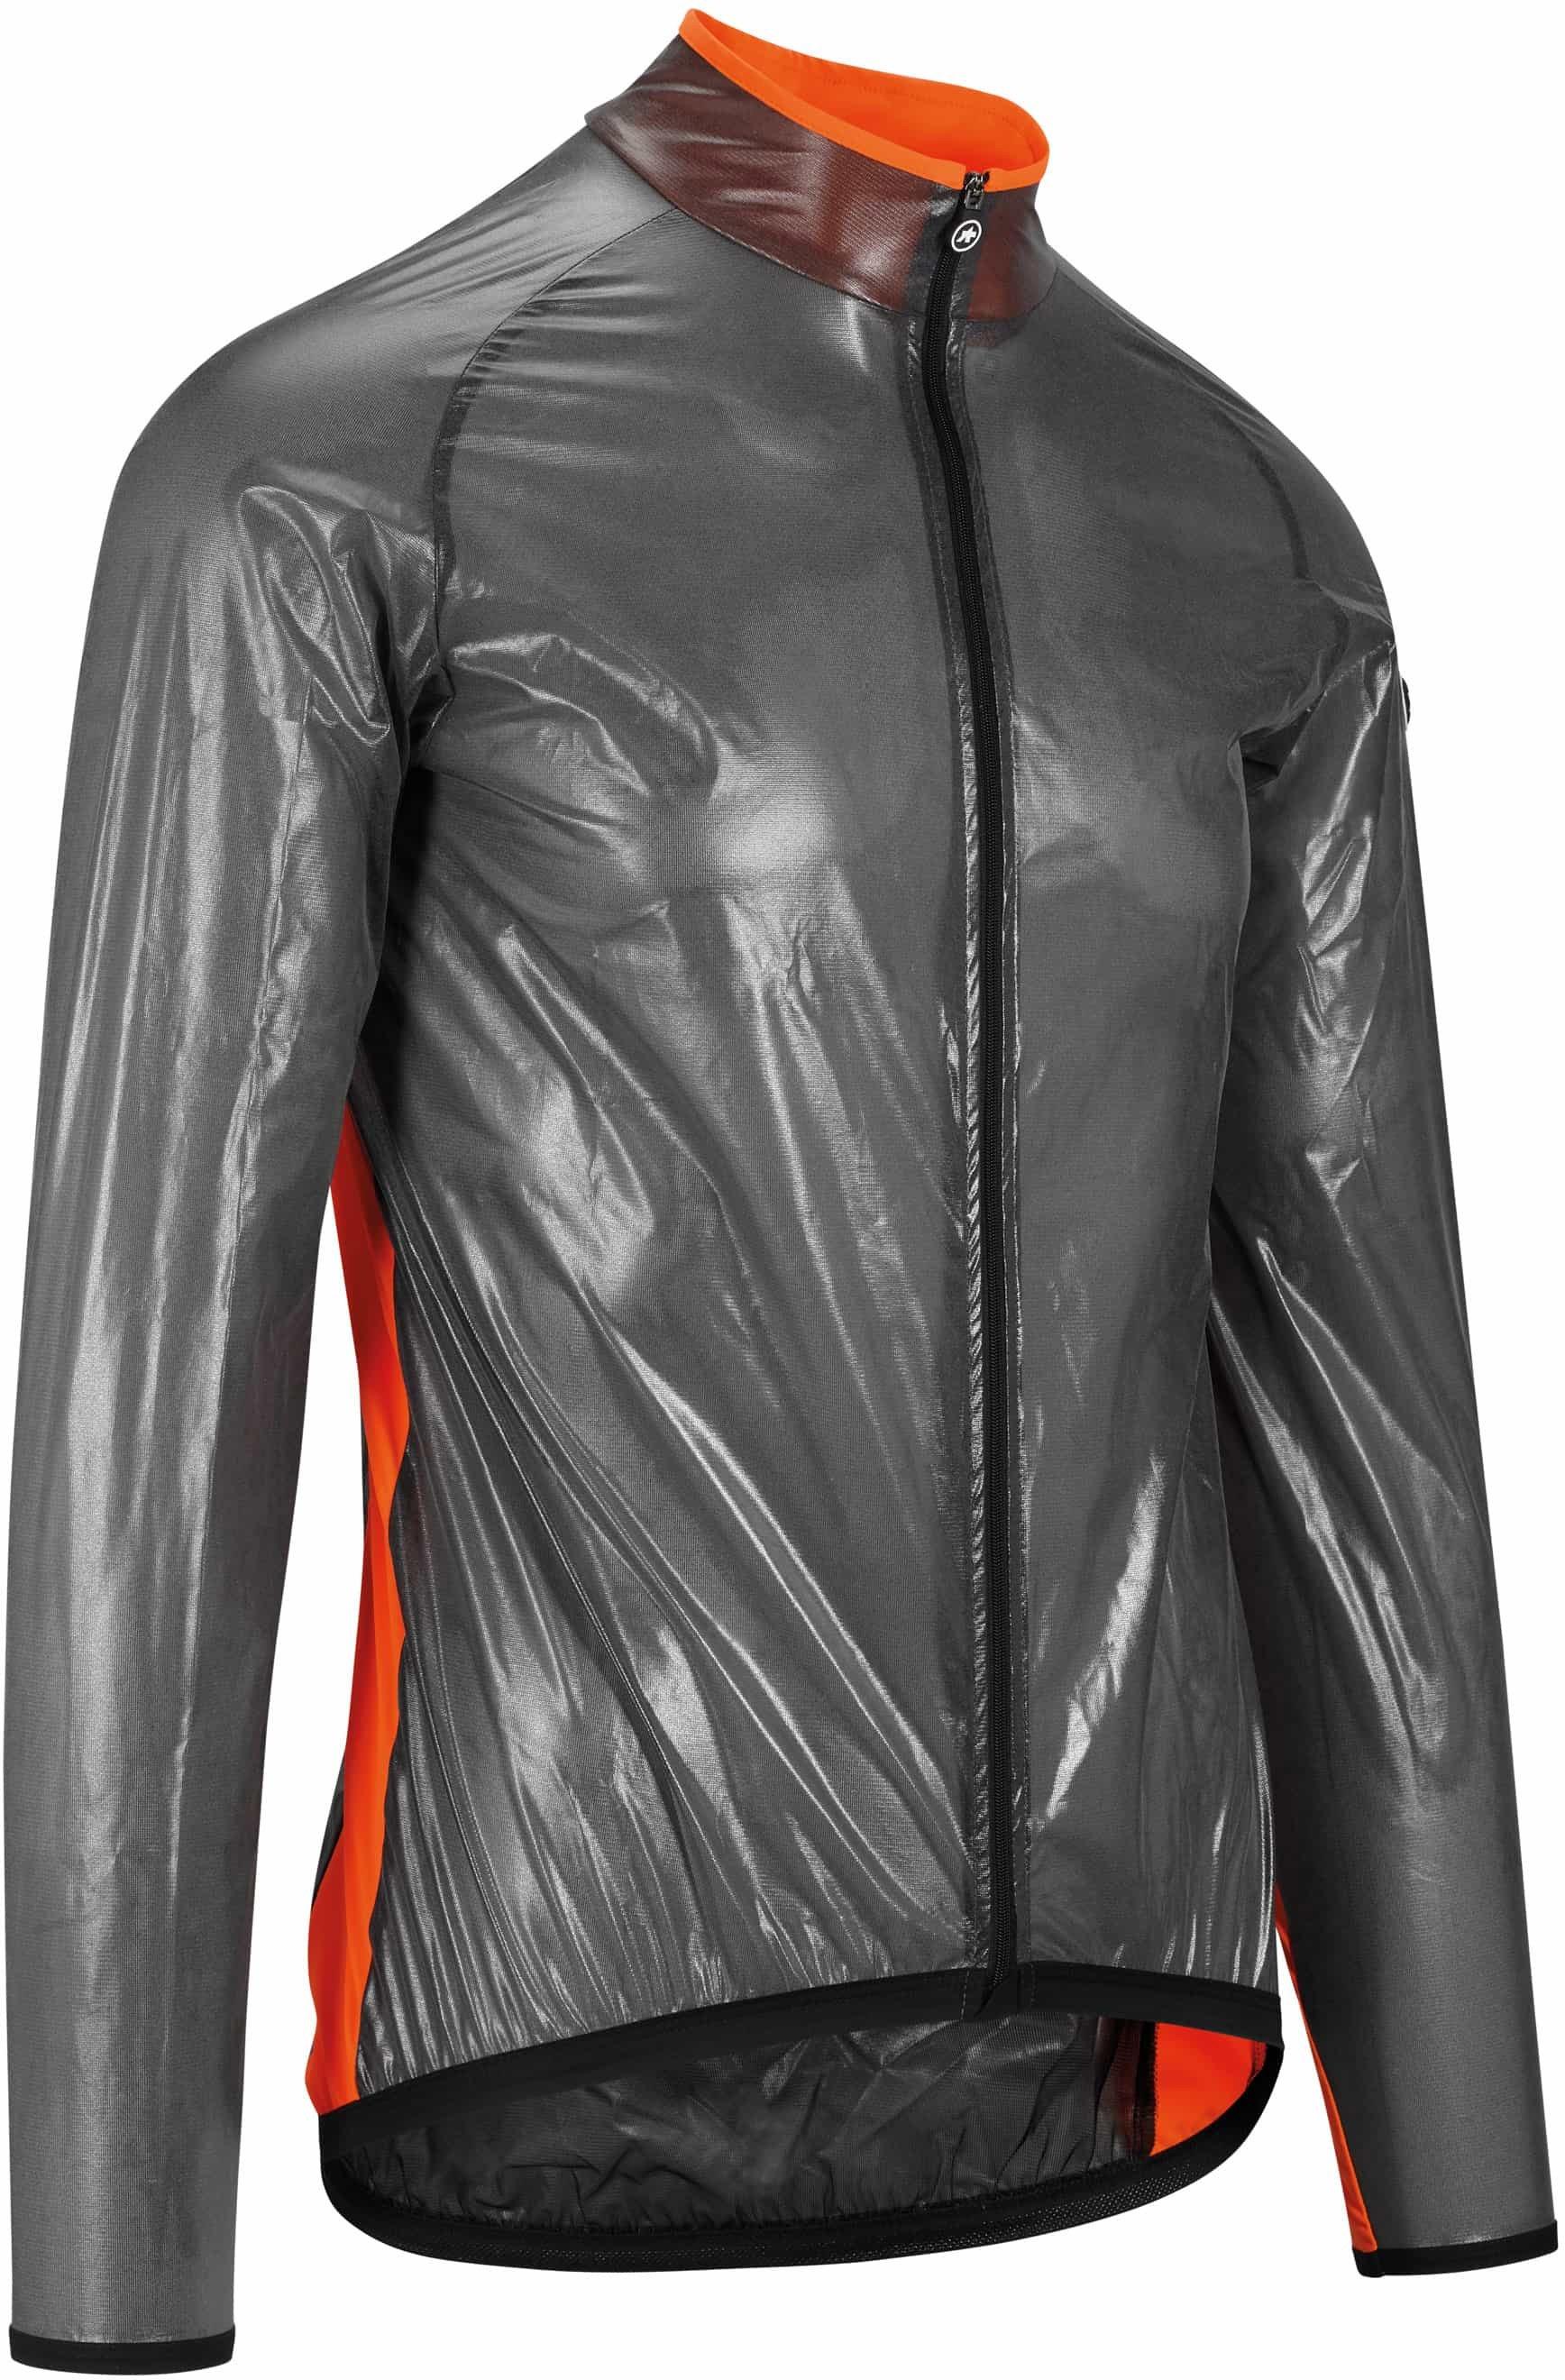 Assos MILLE GT Clima Jacket - Sort/Rød  »  Cloth Size: XS (X-Small)